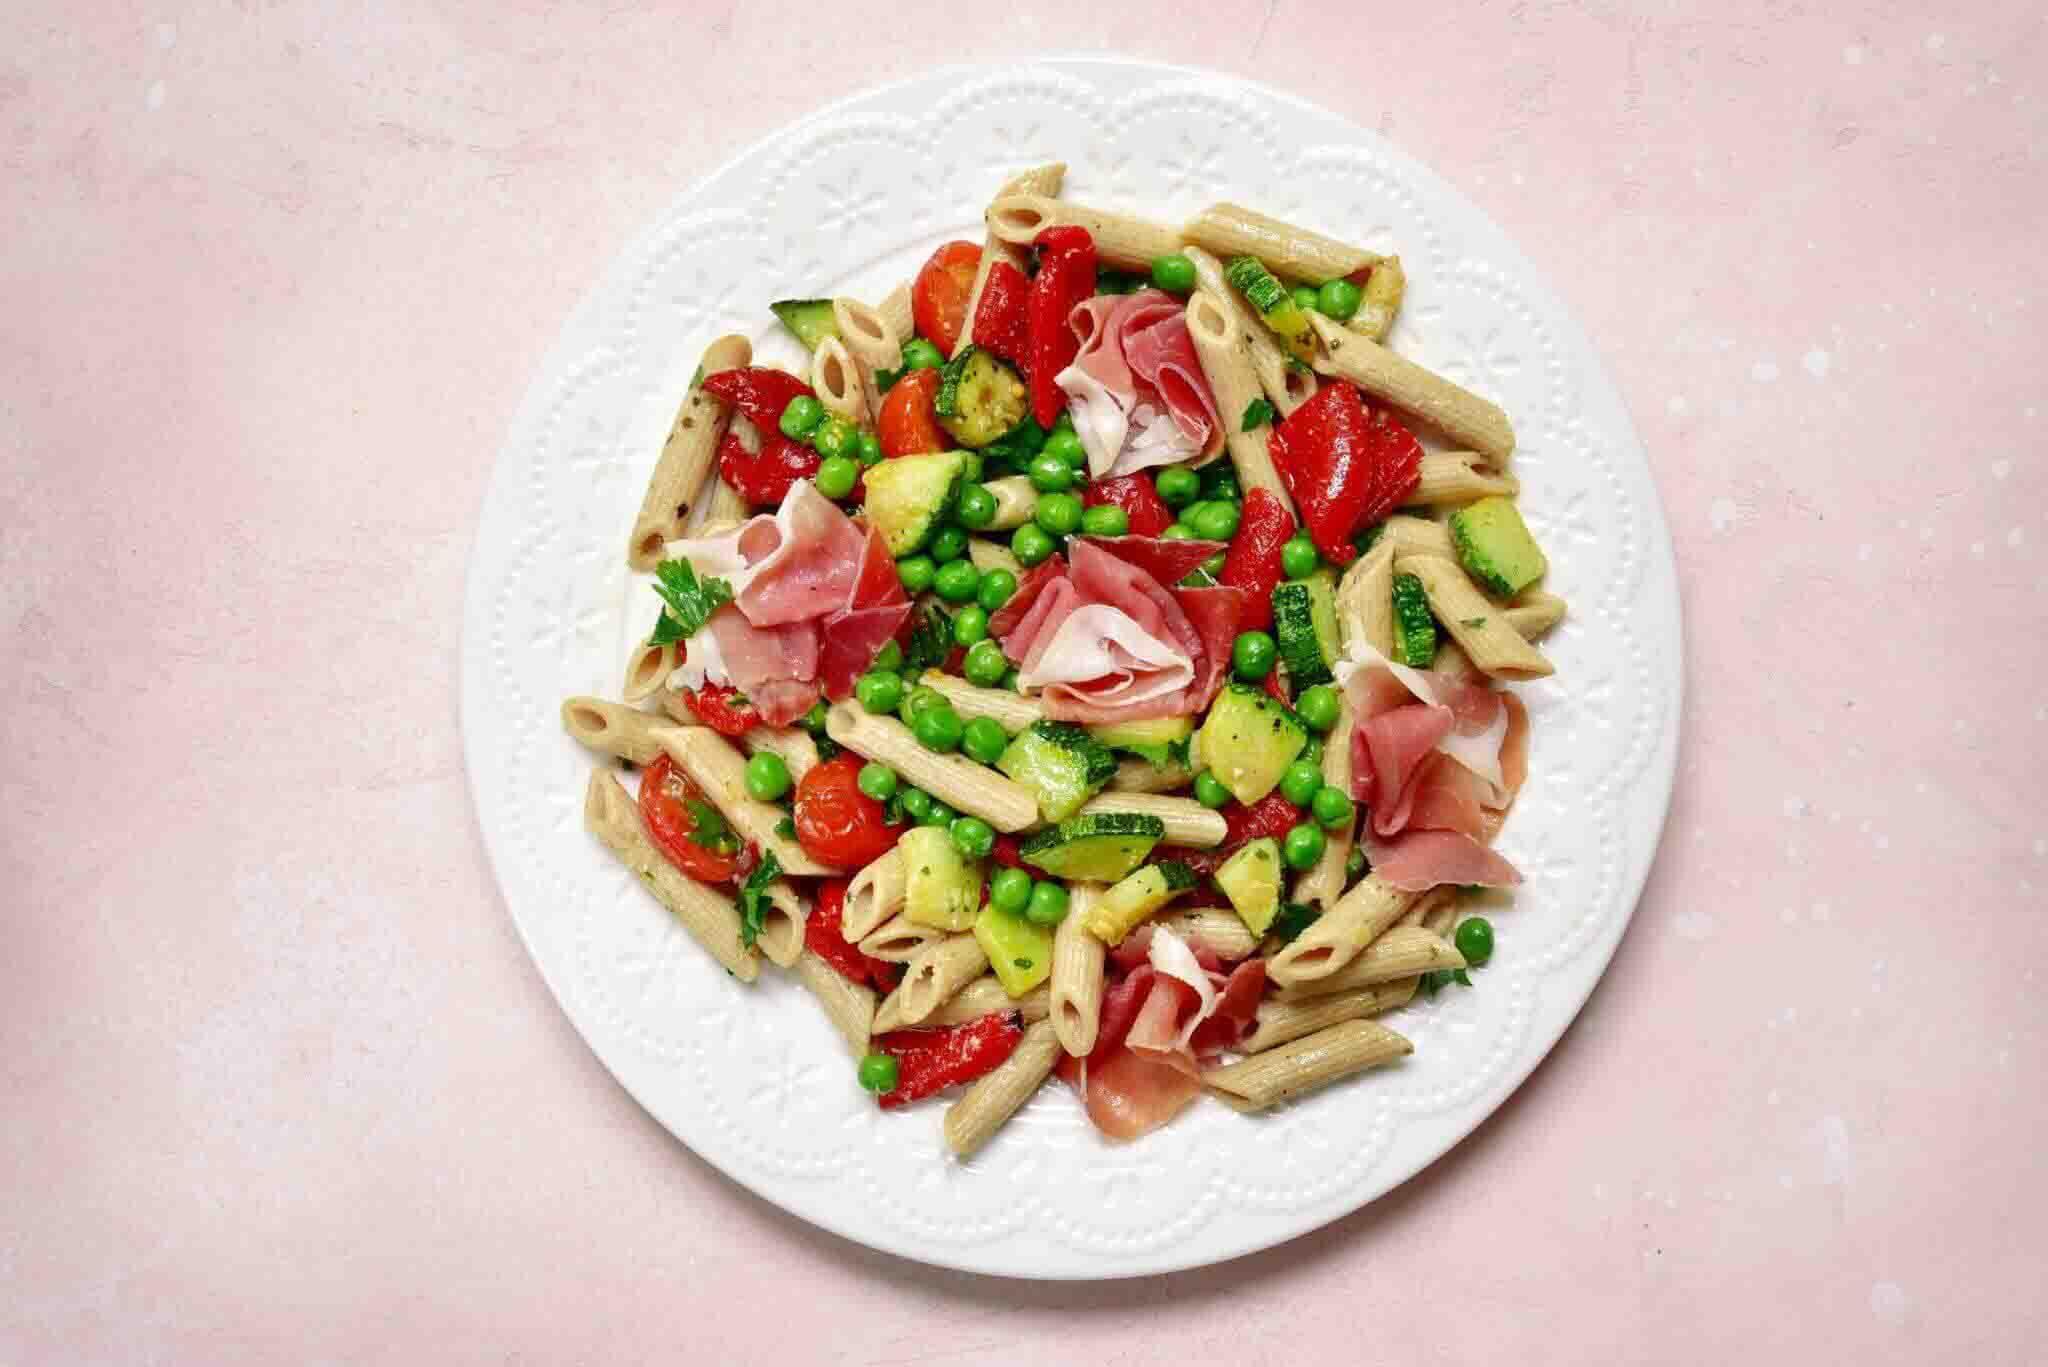 Plato de pasta con calabacín, guisantes, tomate y jamón. Receta fácil.